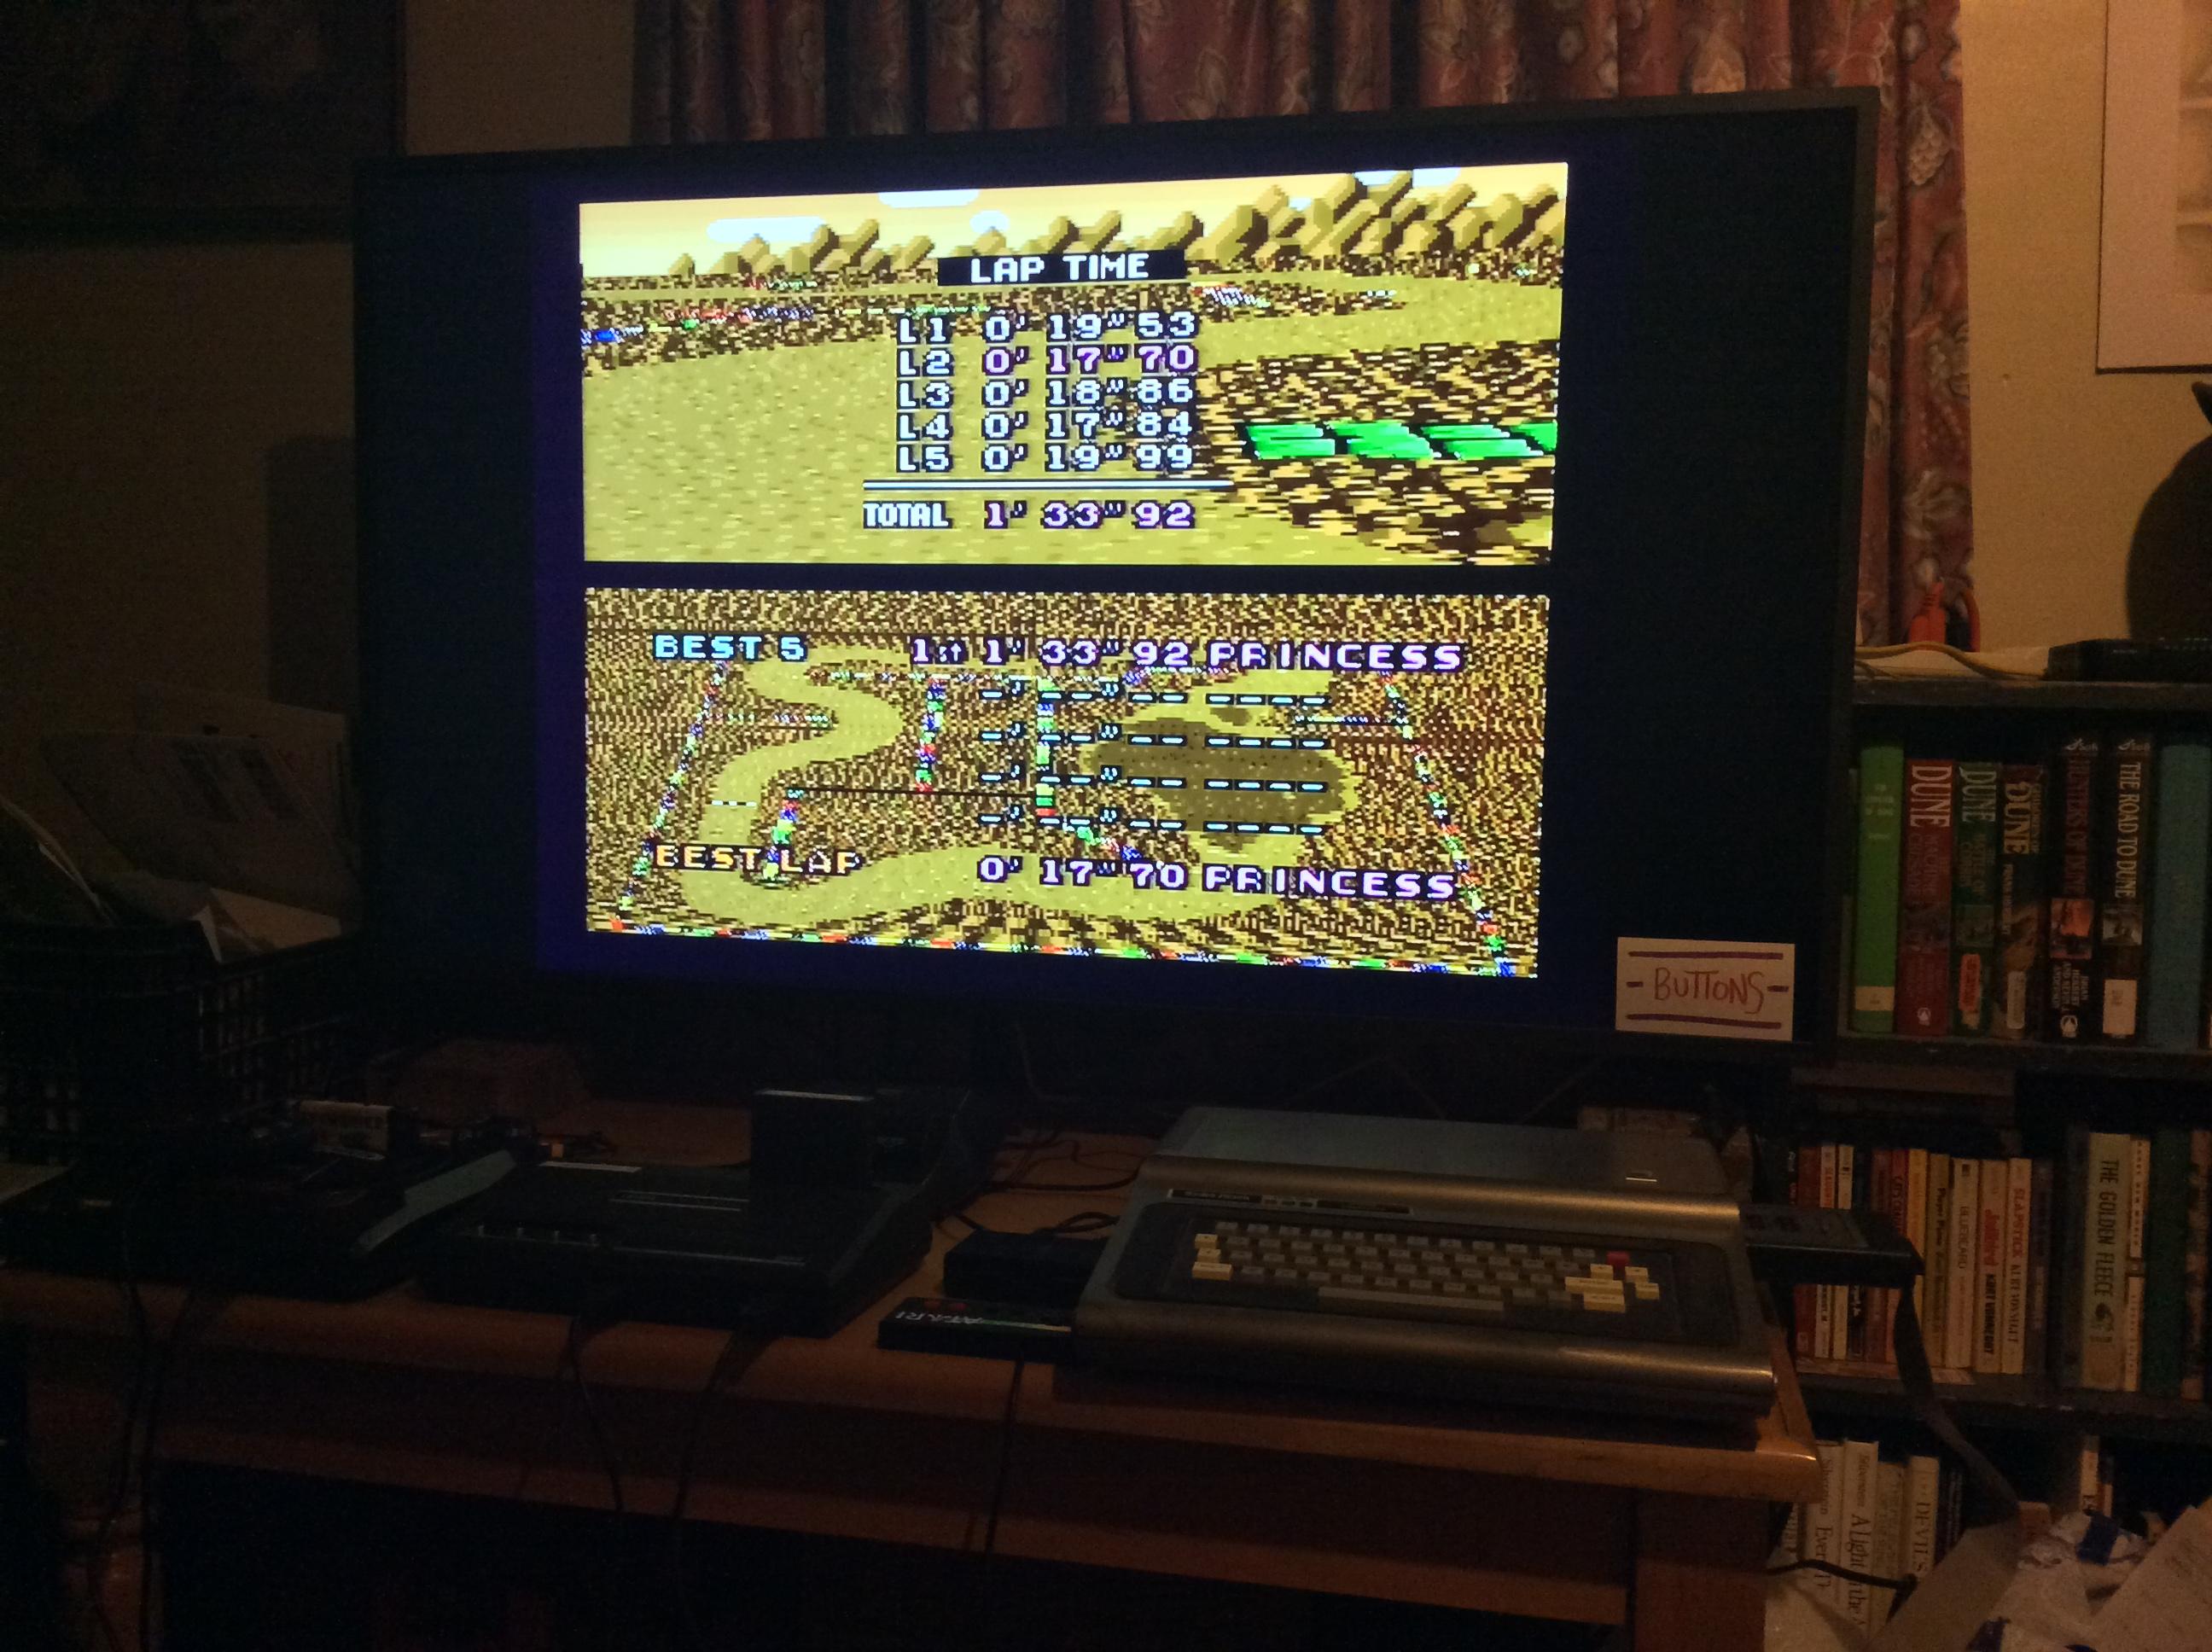 Super Mario Kart: Choco Island 2 [Time Trial] time of 0:01:33.92